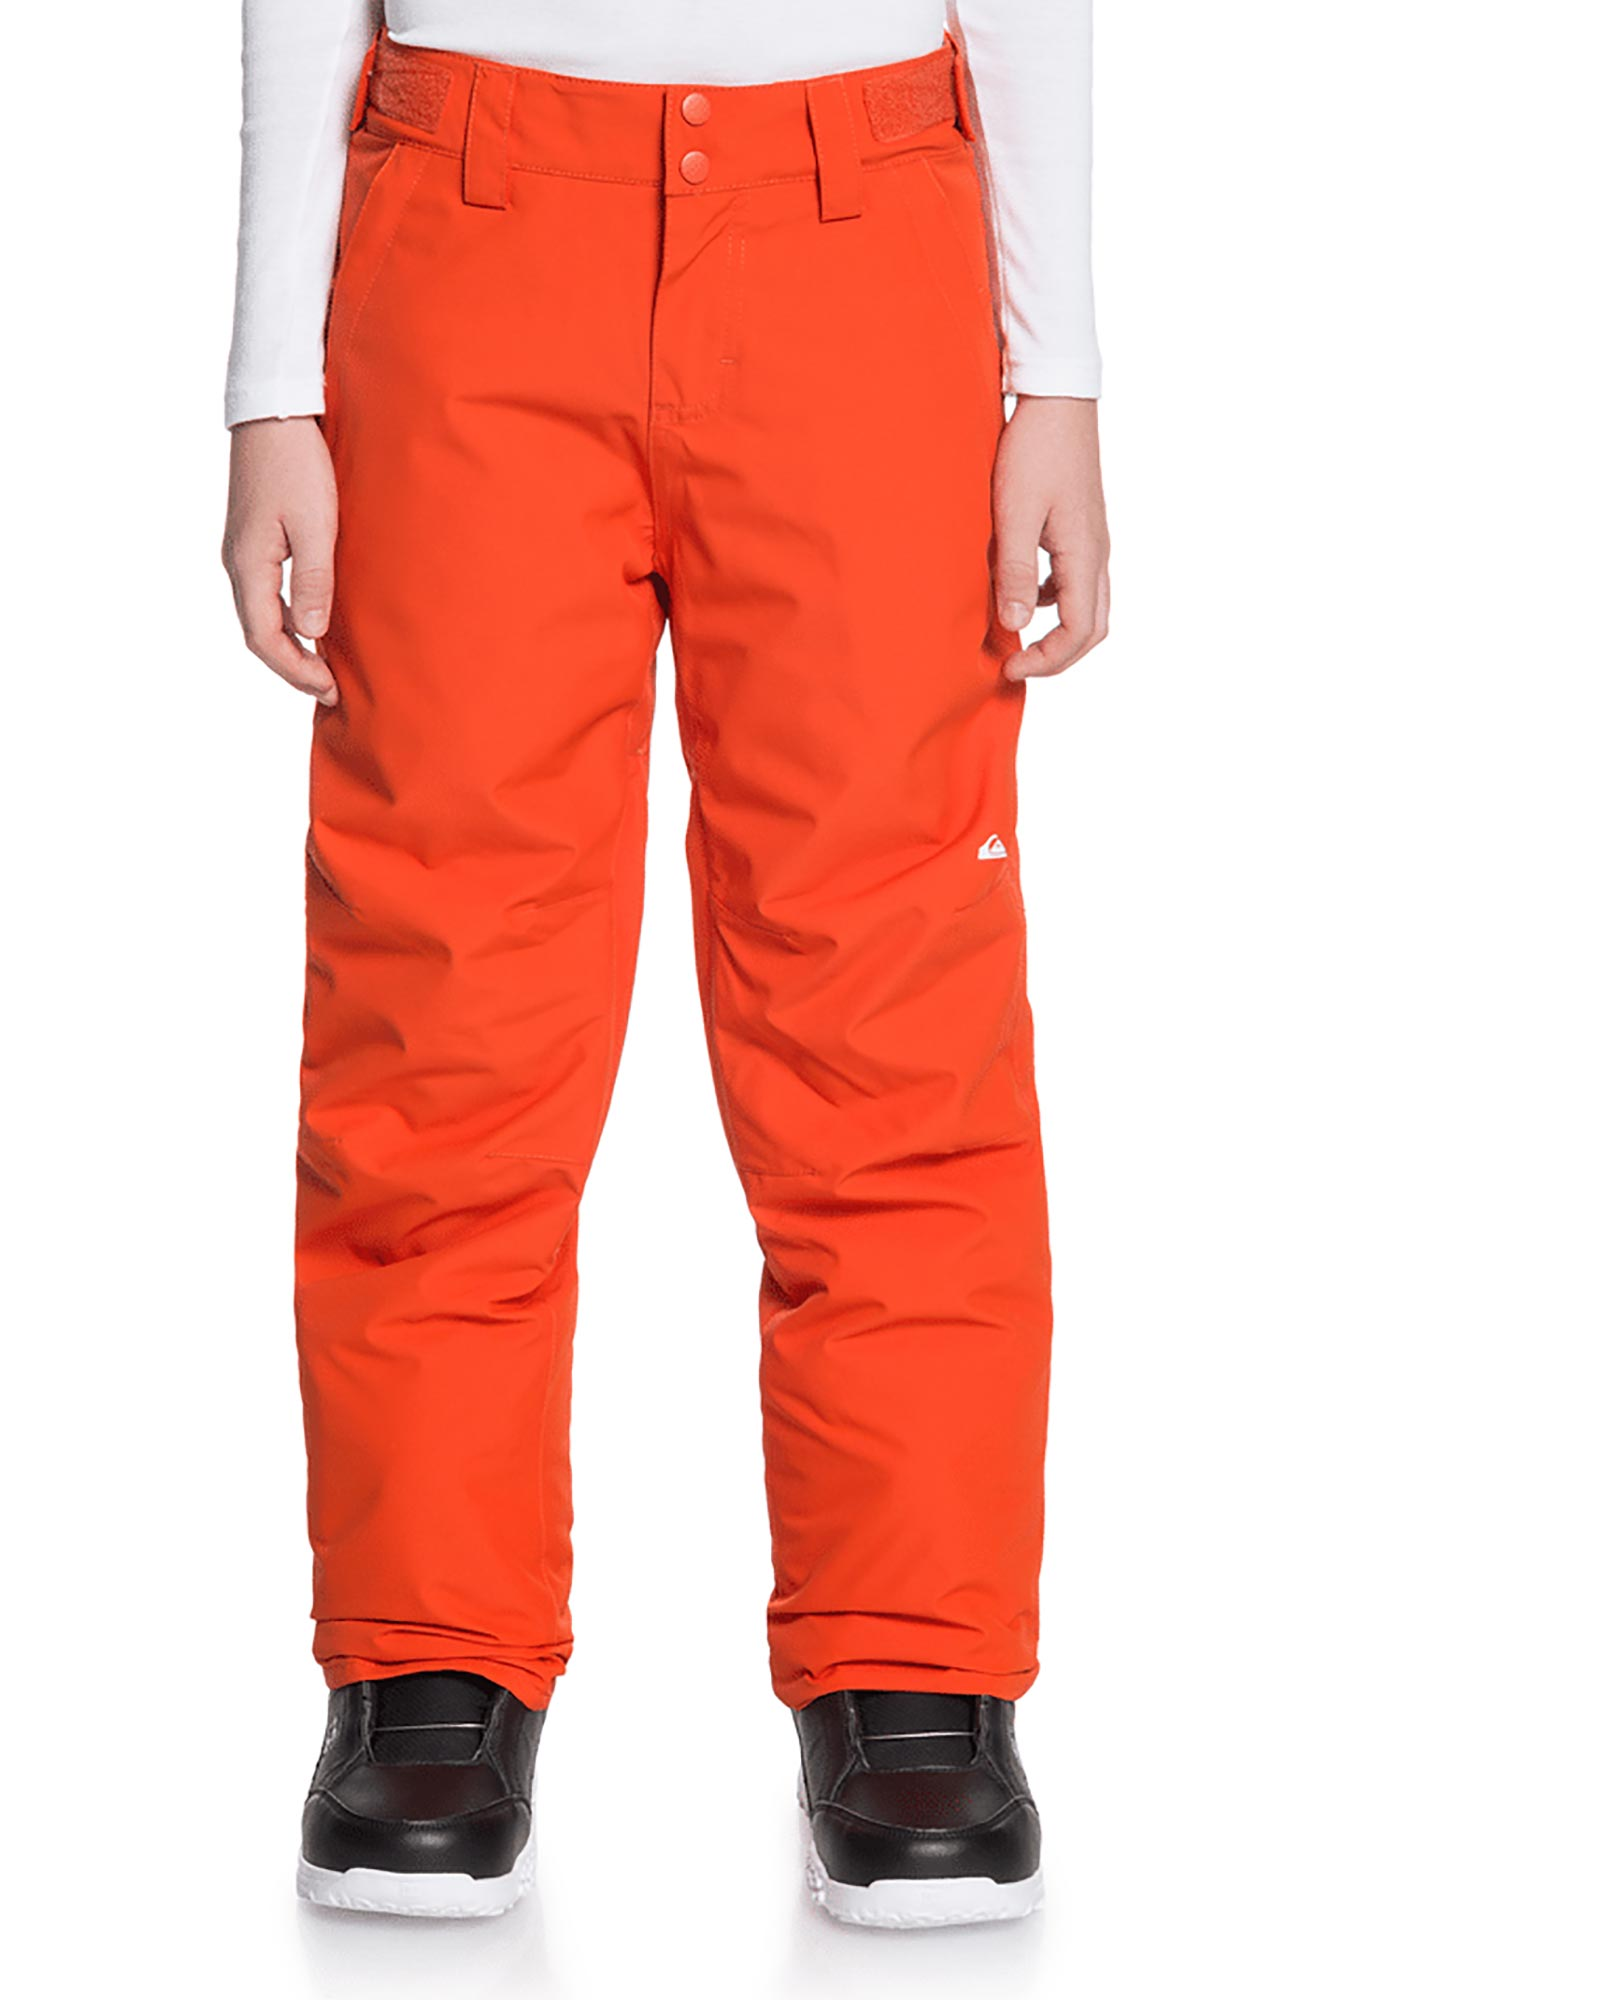 Product image of Quiksilver estate Boys' Pants